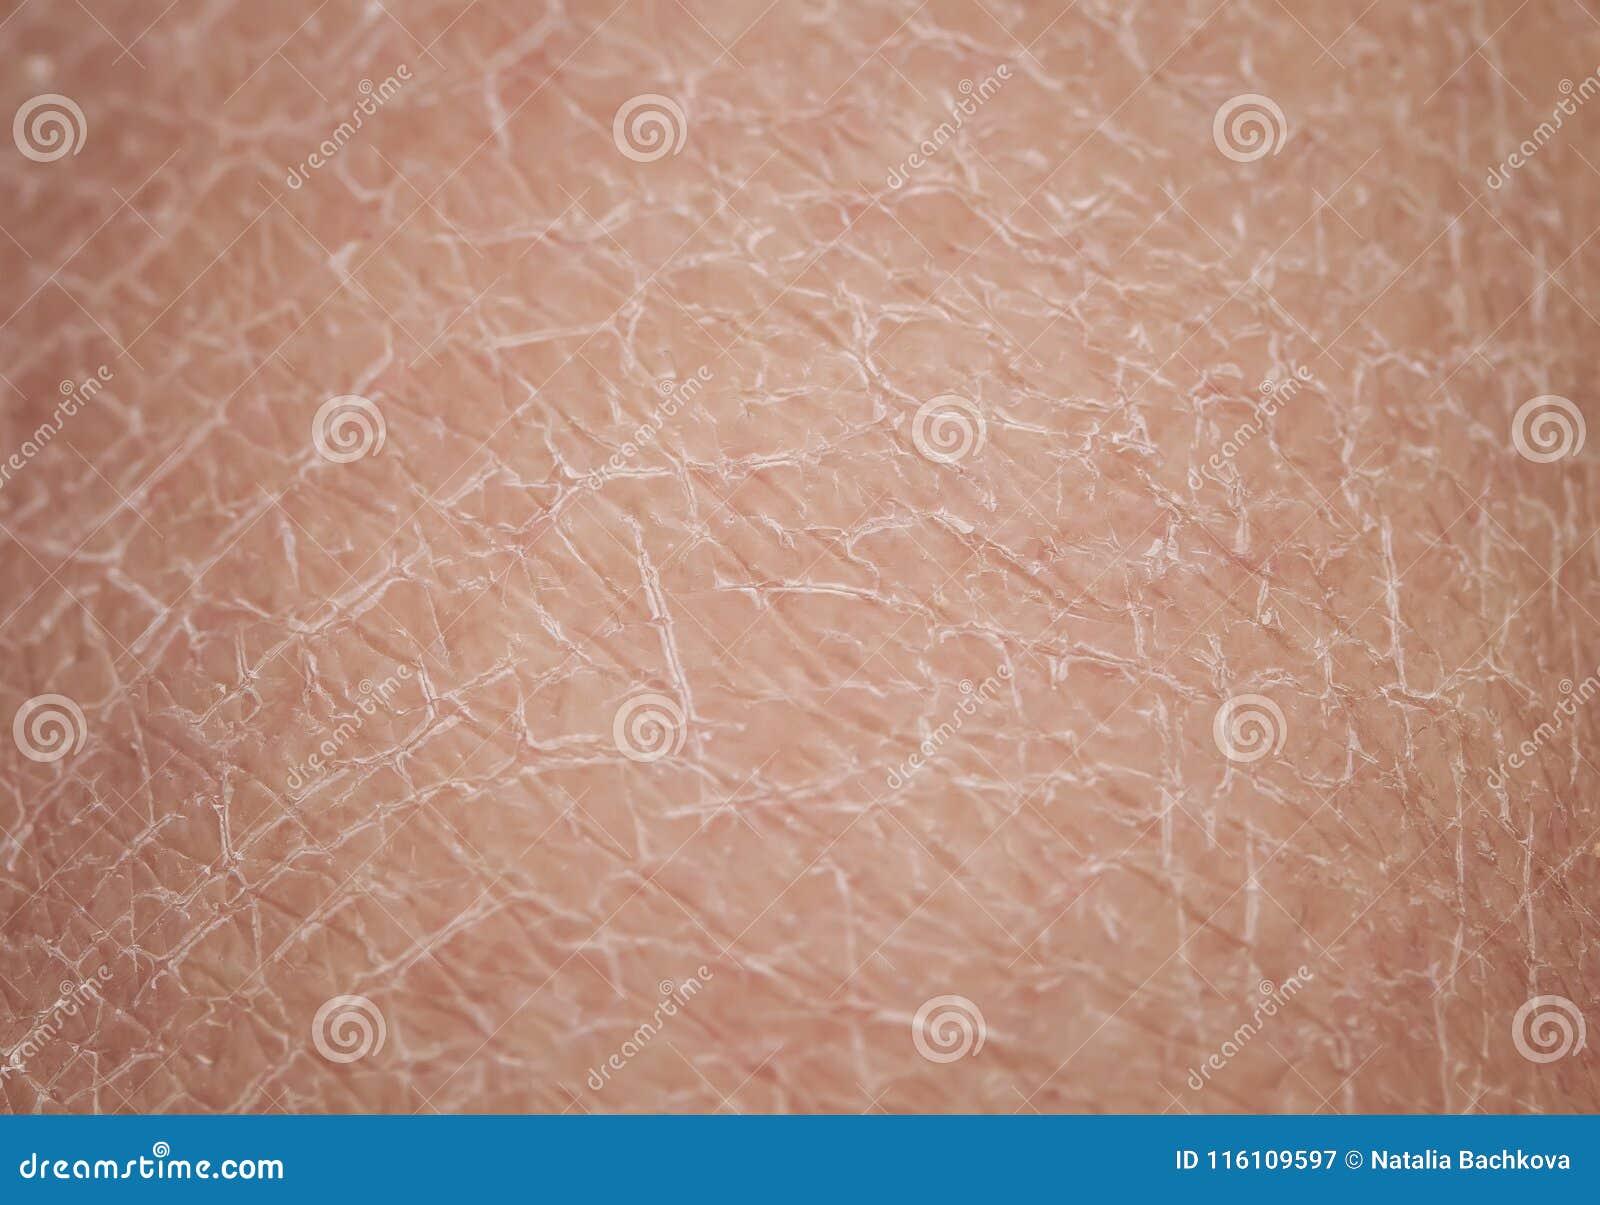 53edaff179bf Σύσταση του ανθρώπινου δέρματος μεγάλη με τα δερματολογικά προβλήματα της  ξηρότητας και του ραγίσματος